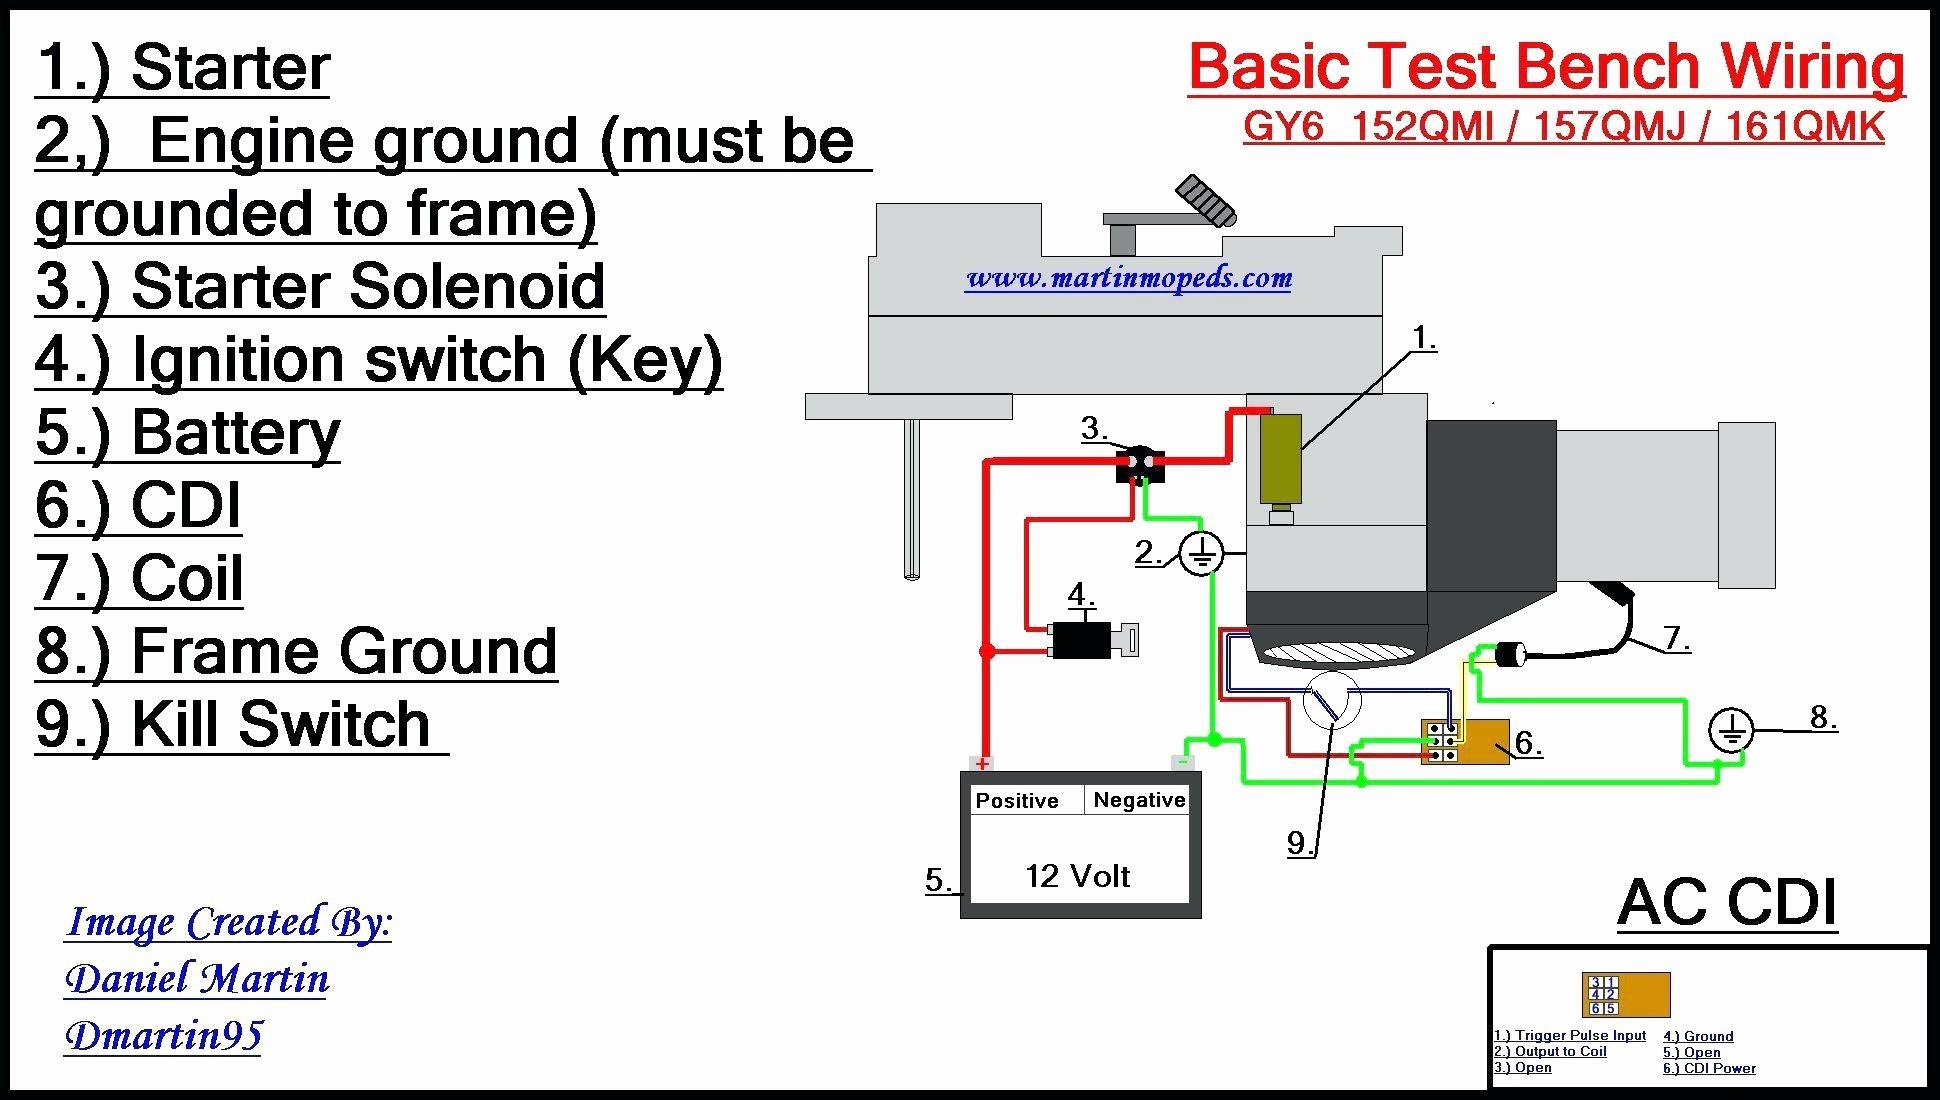 Cdi Wiring Diagram New 5 Pin Cdi Box Wiring Diagram New Cdi Wiring Diagram Besides 6